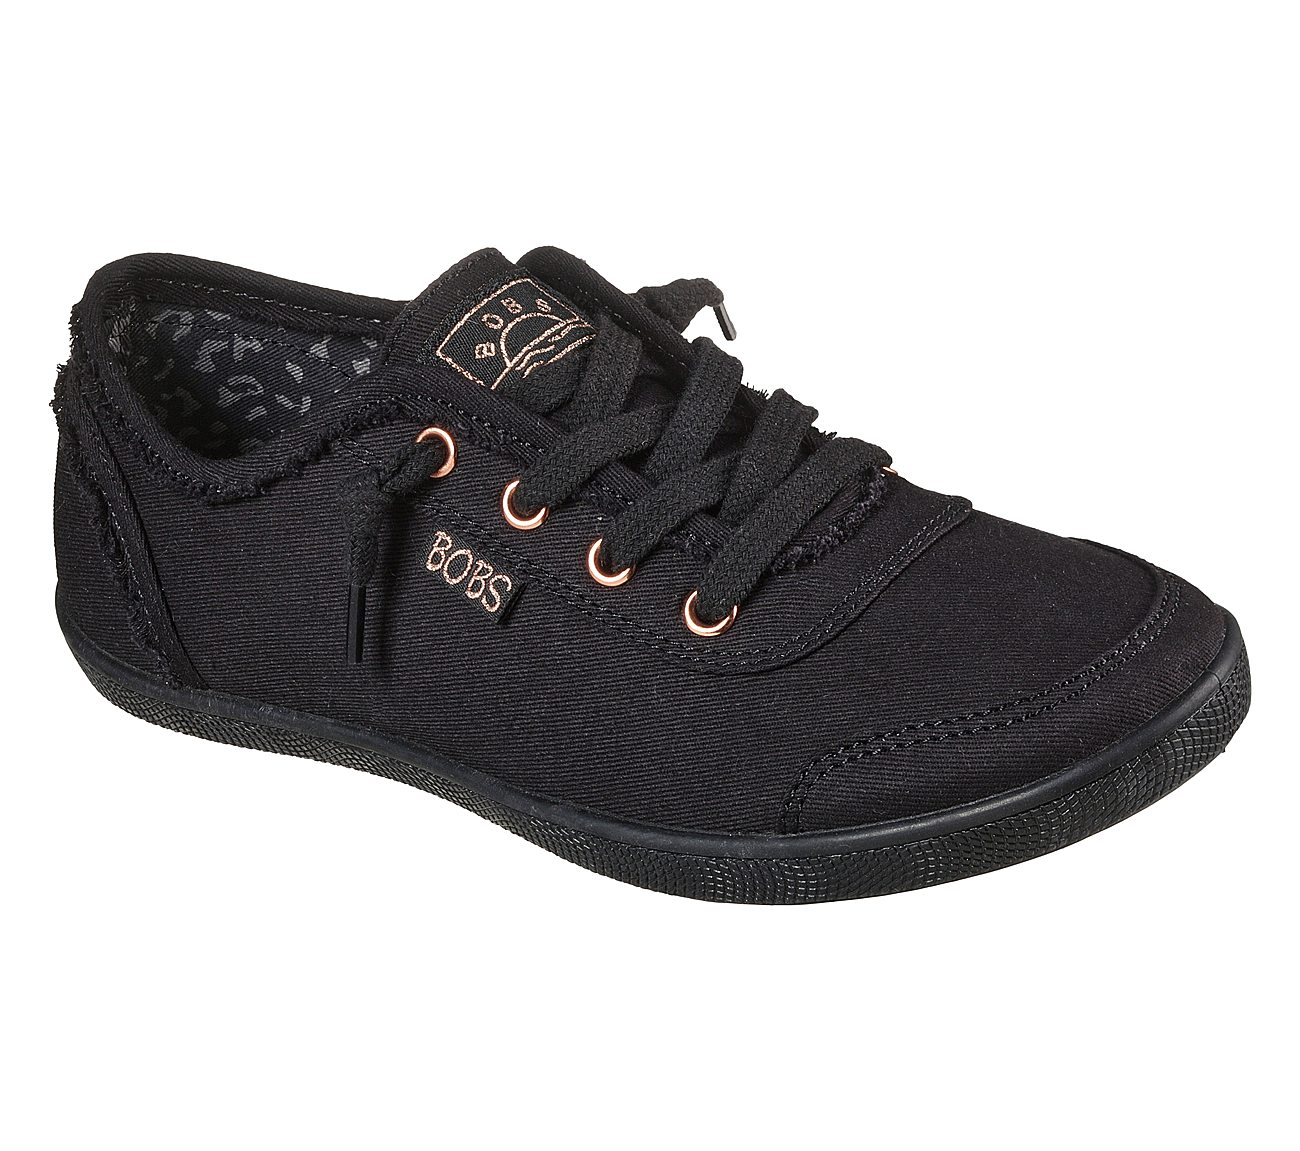 Buy SKECHERS BOBS B Cute BOBS Shoes